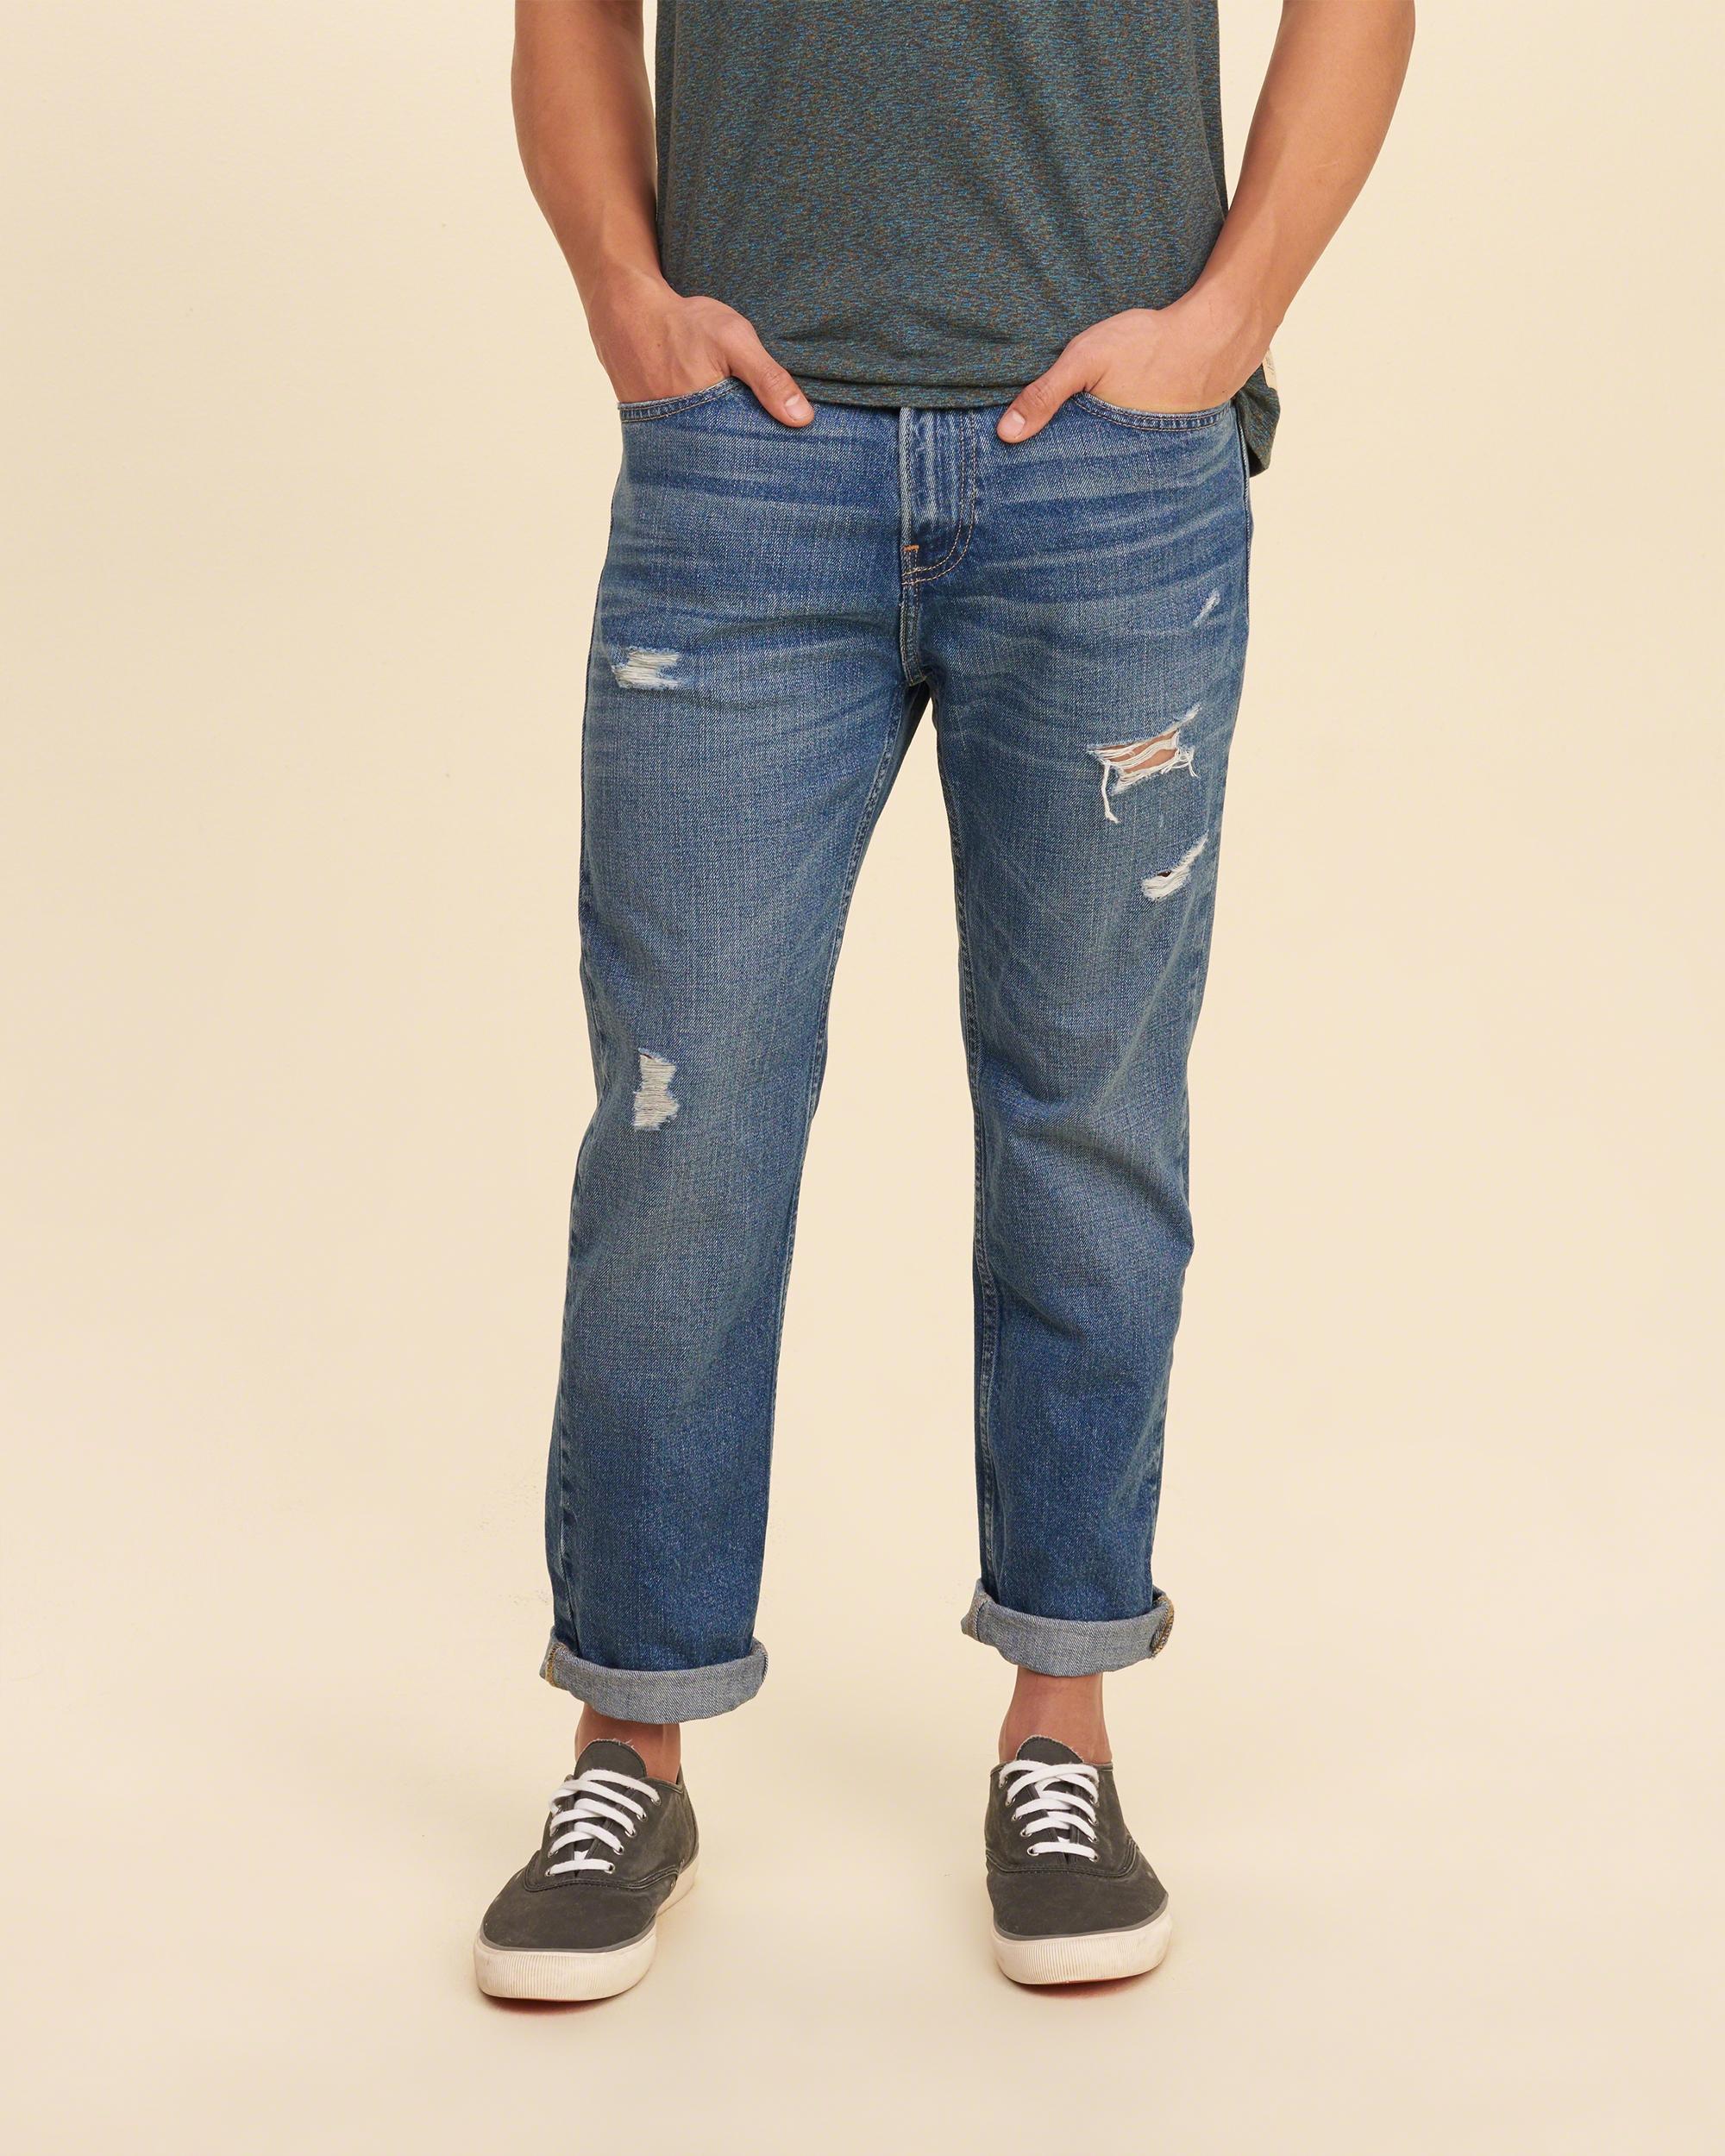 Lyst - Hollister Vintage Straight Jeans in Blue for Men